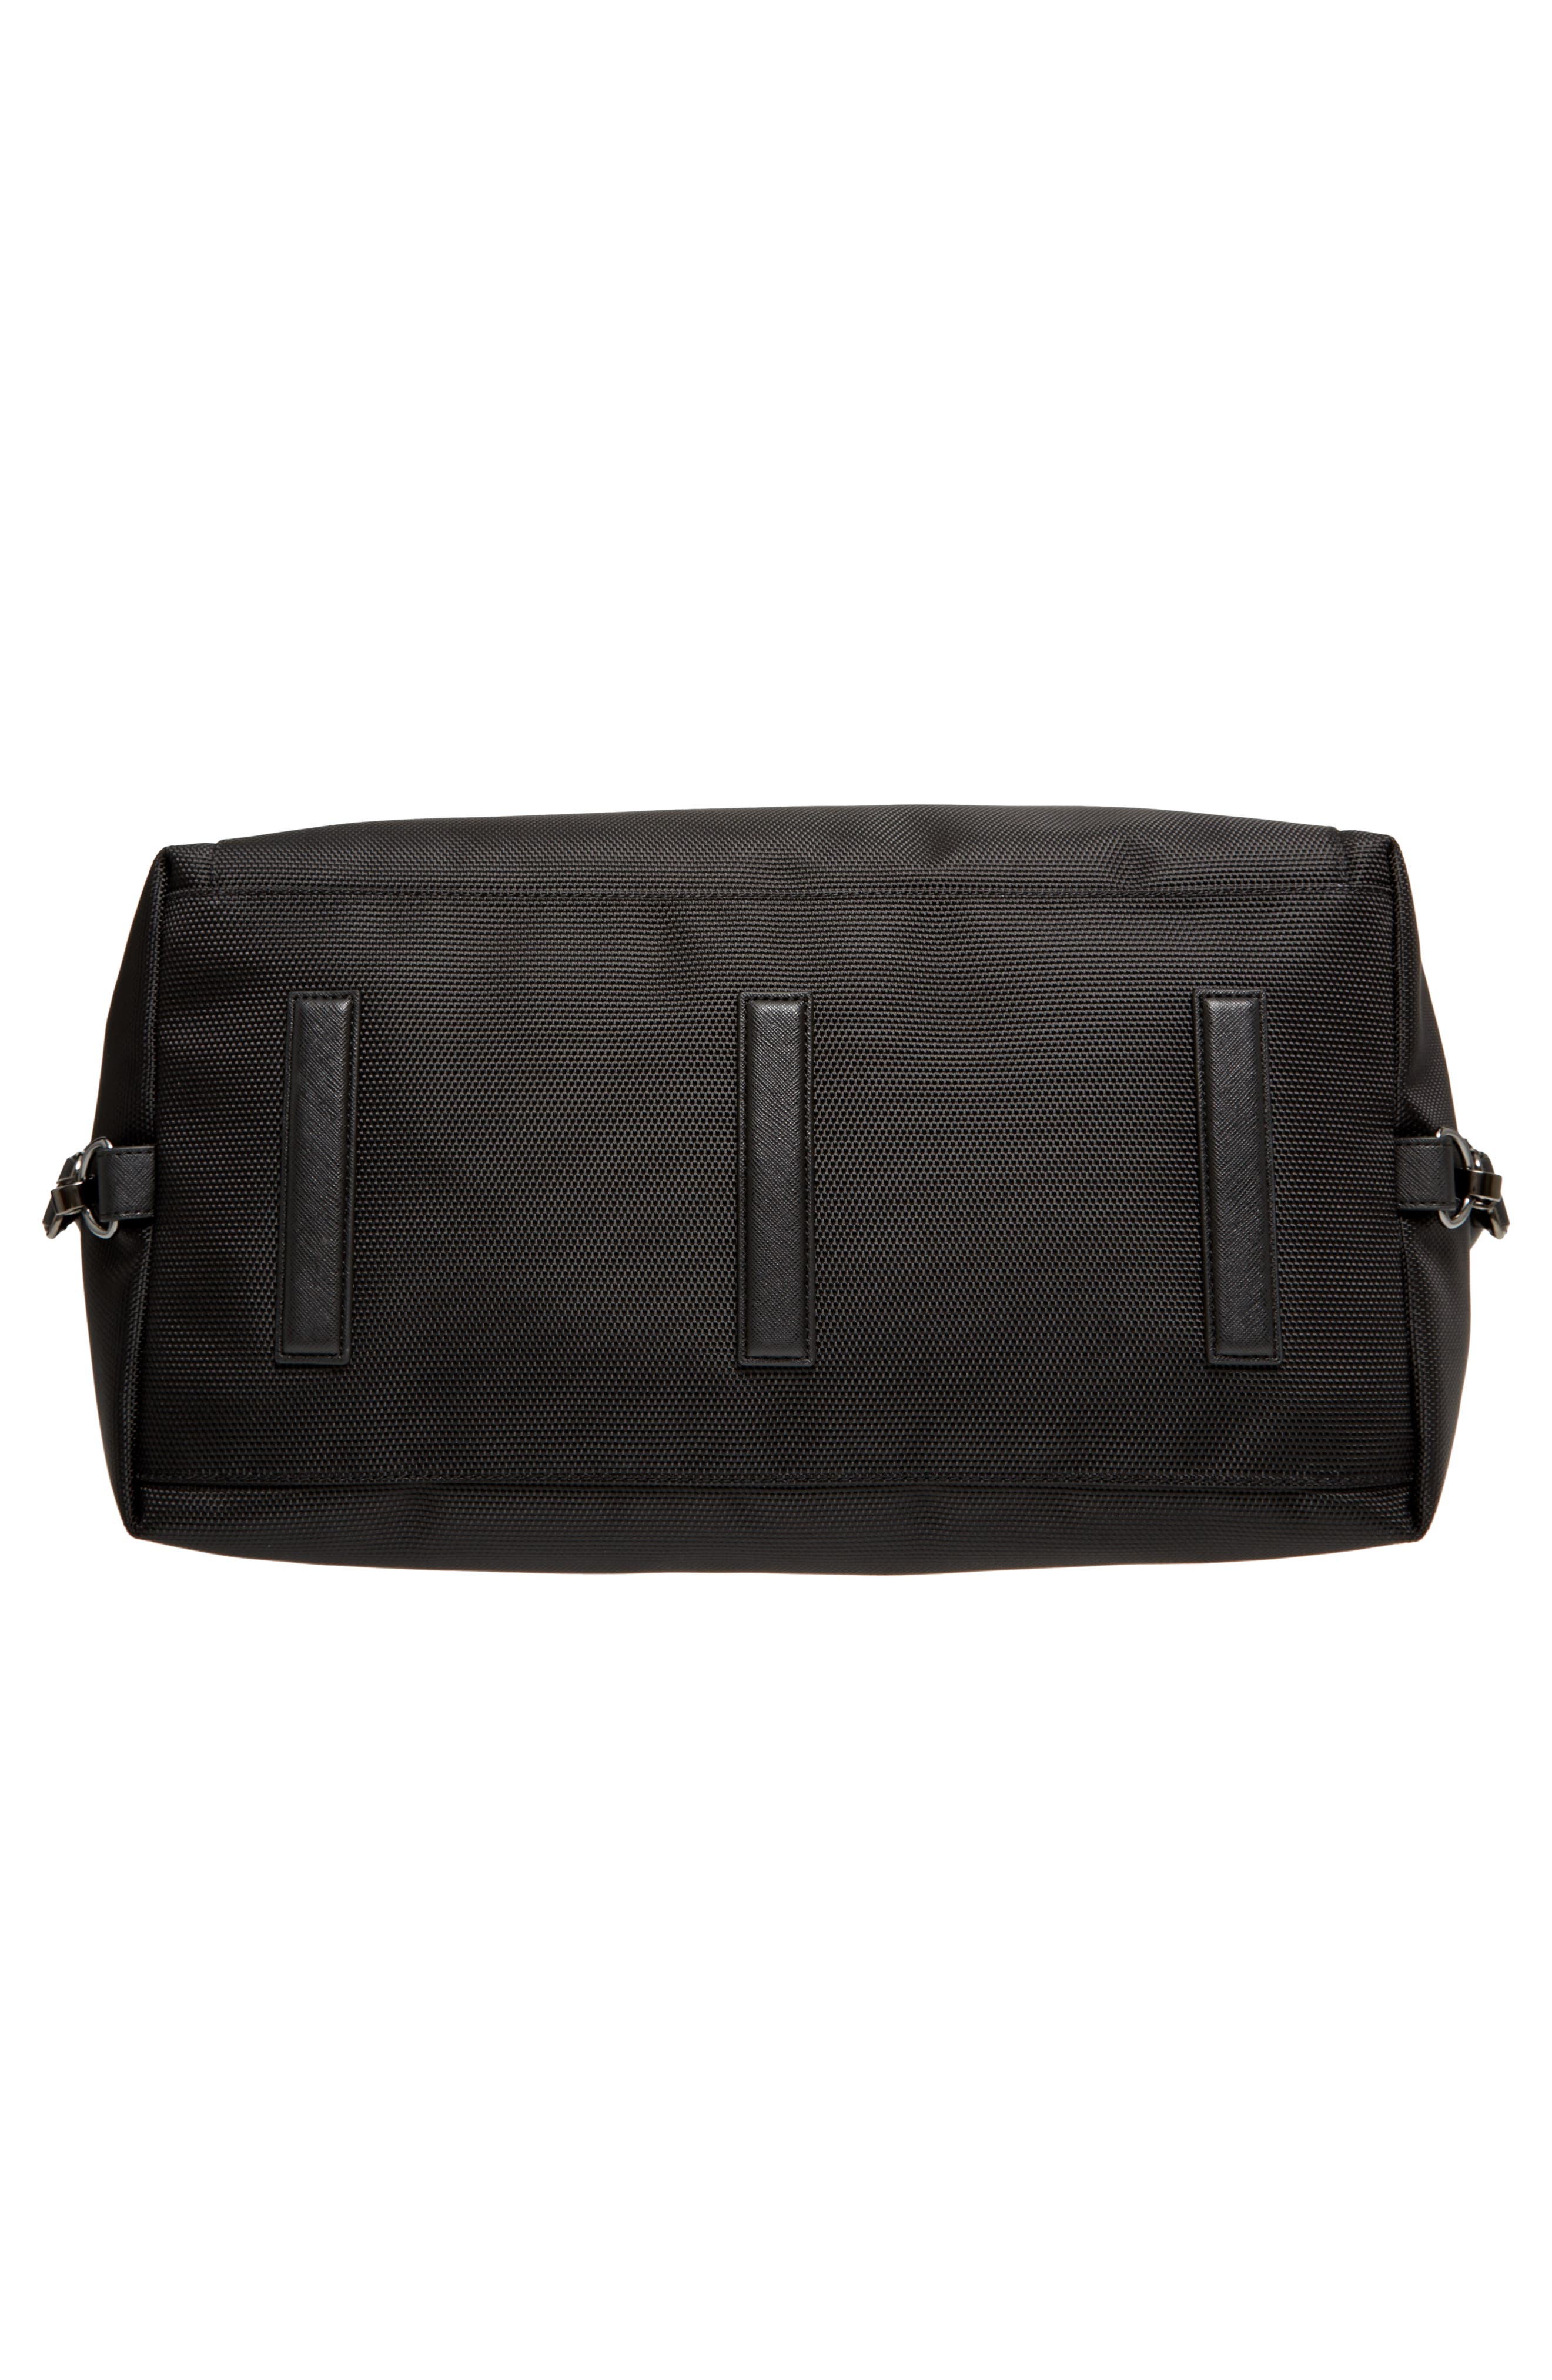 Smart Duffel Bag,                             Alternate thumbnail 6, color,                             Black